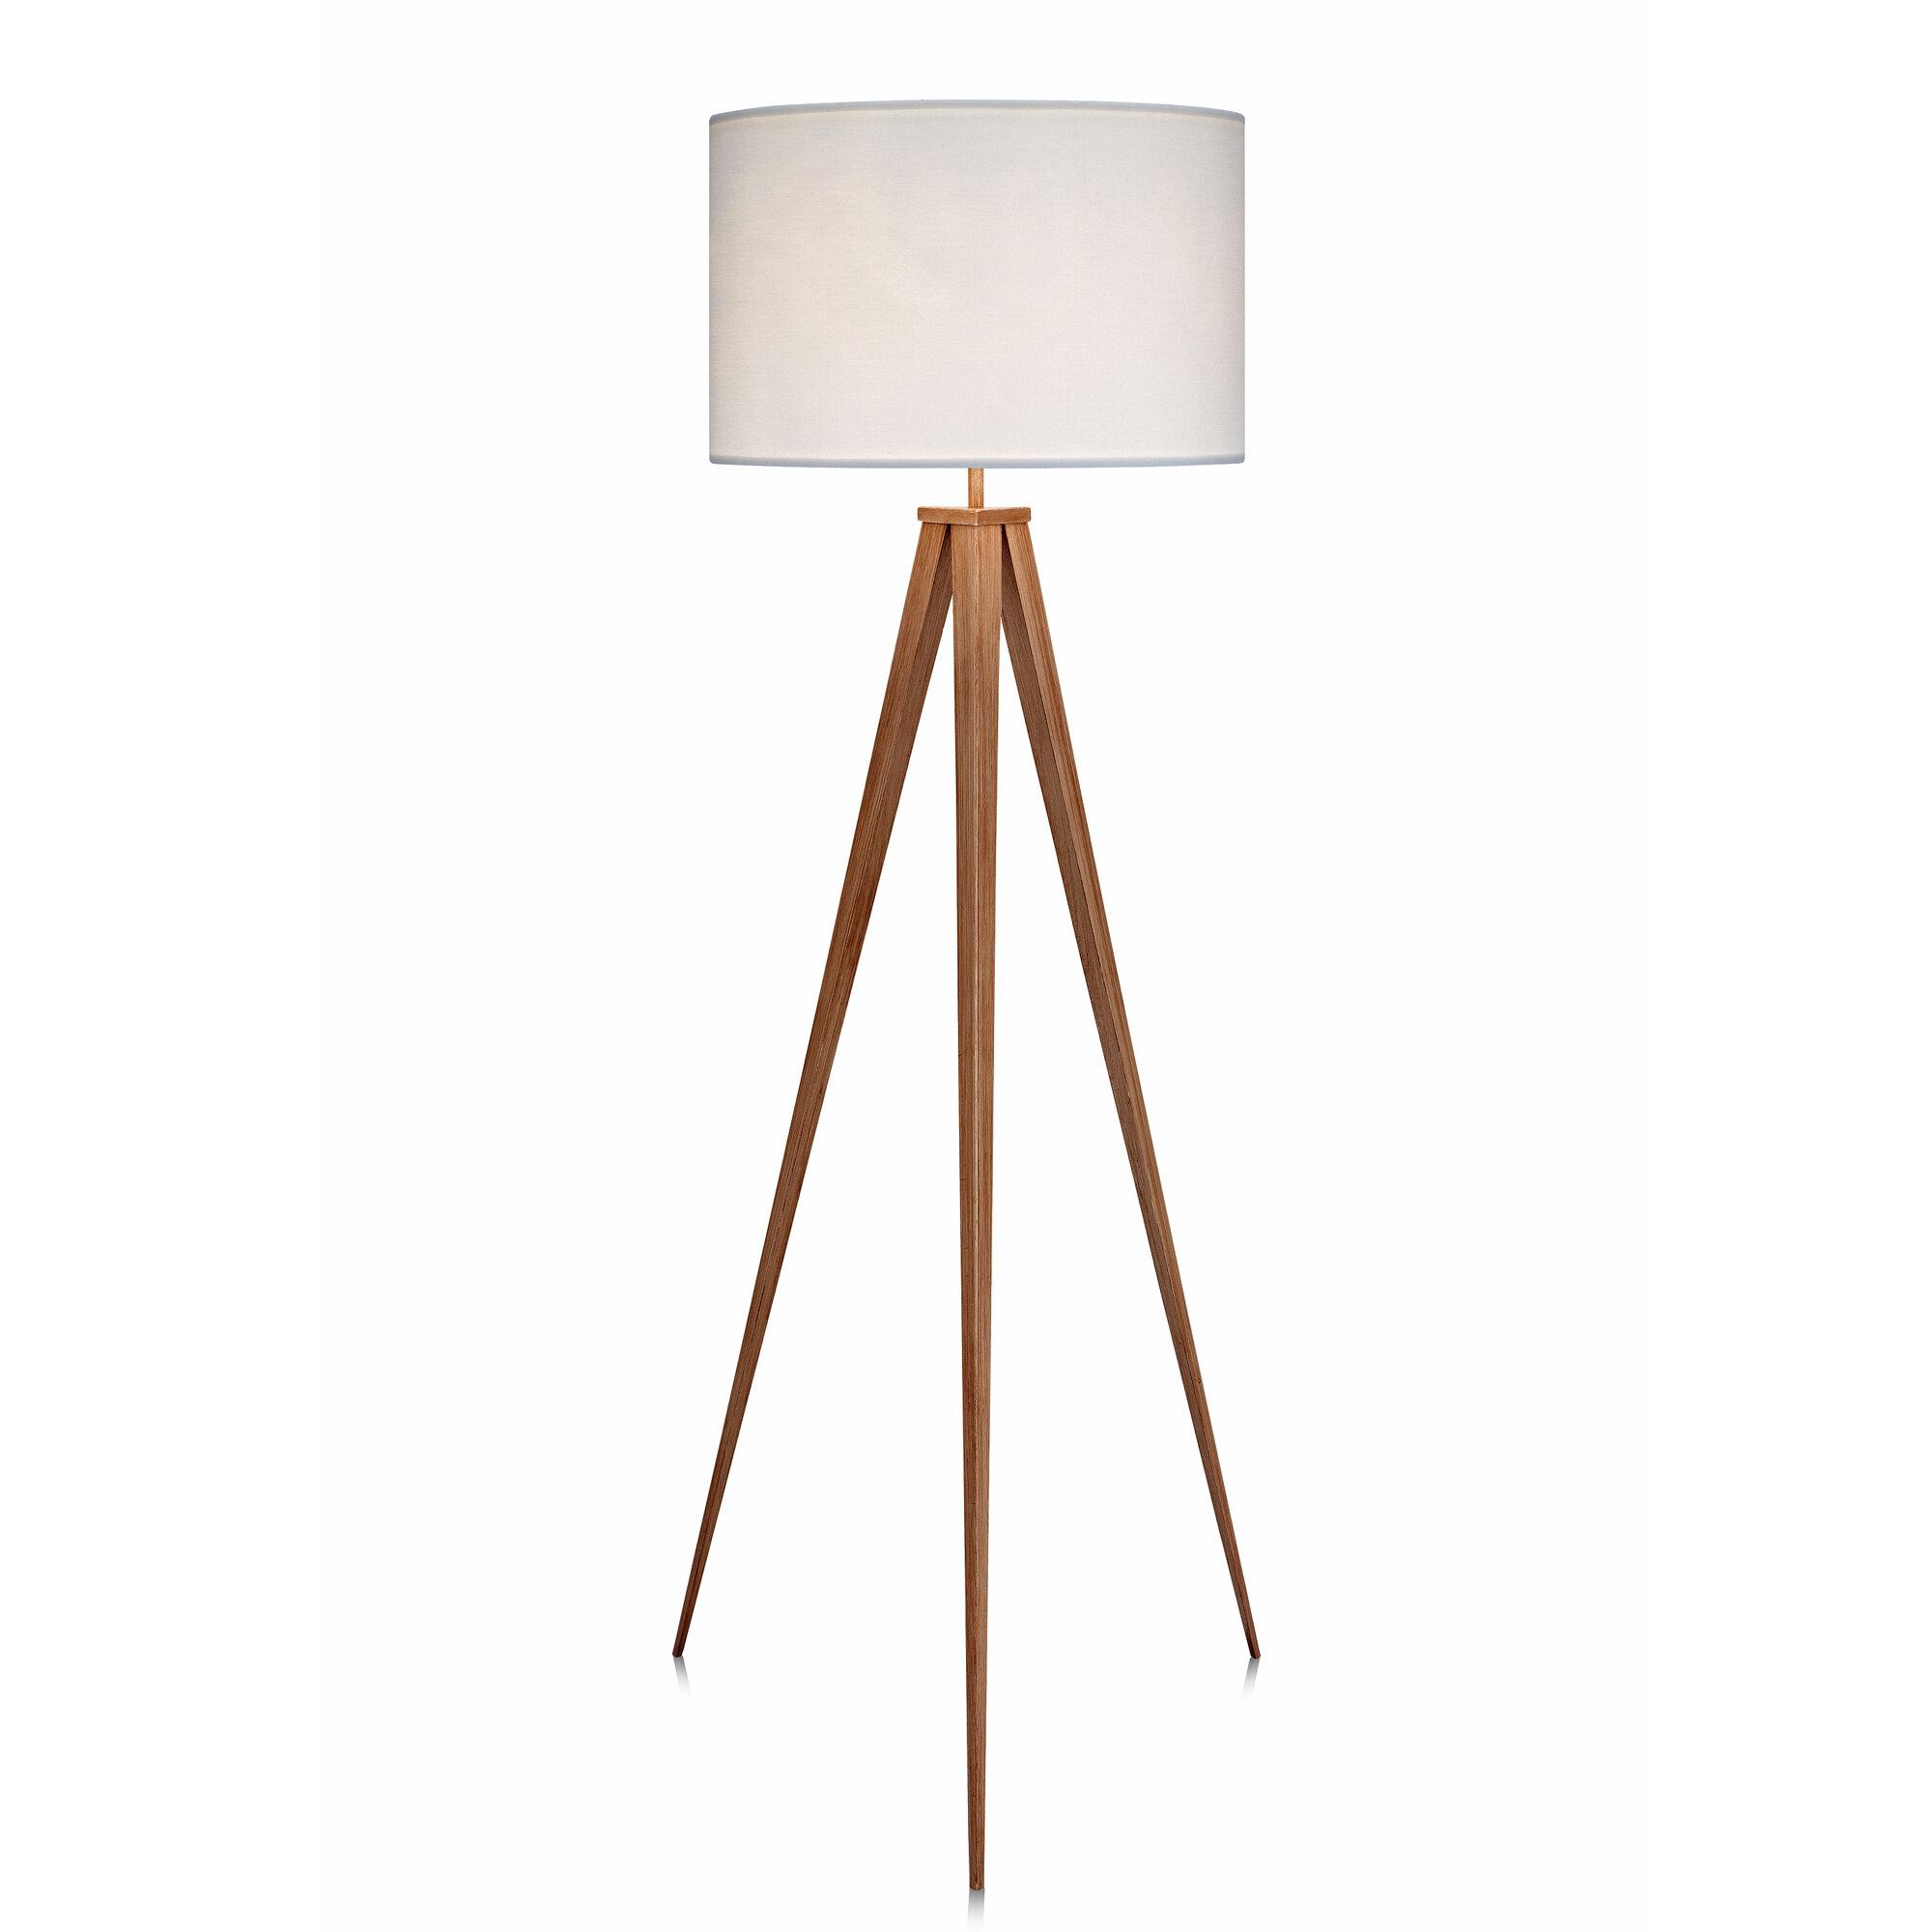 Floor Lamps Tripod 2020 2020 @house2homegoods.net